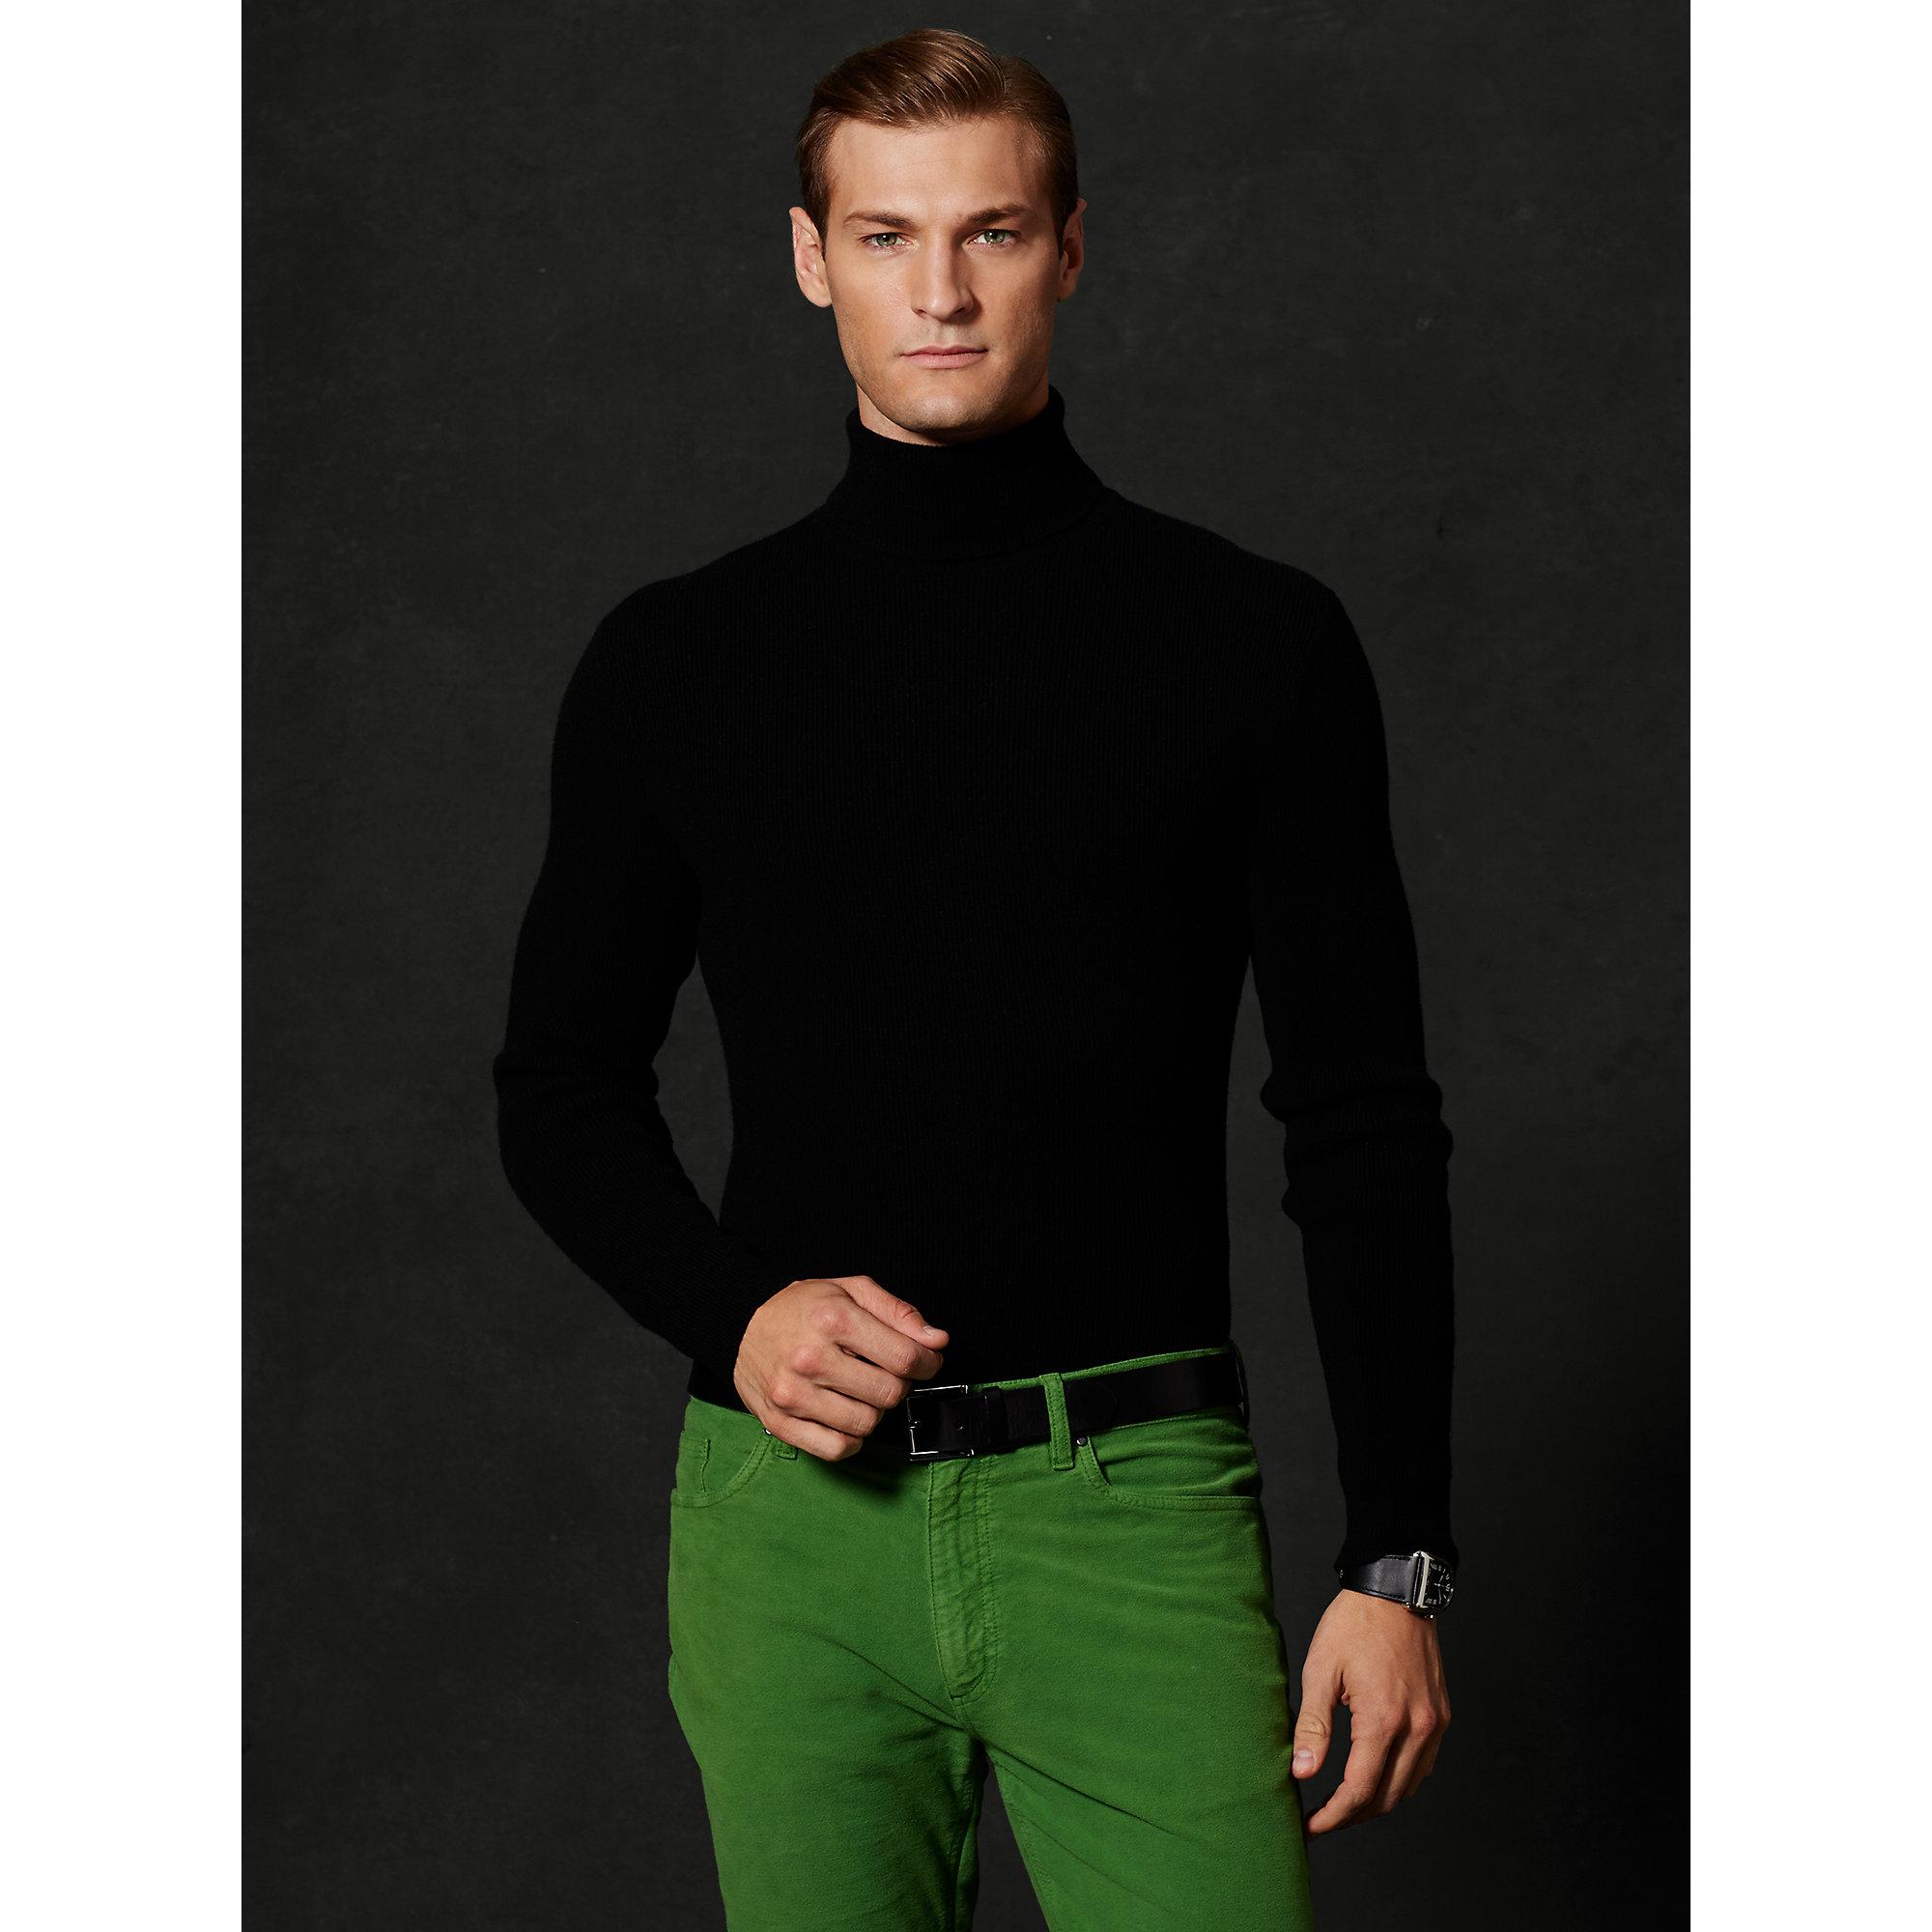 Ralph lauren purple label Cashmere Turtleneck Sweater in Black for ...